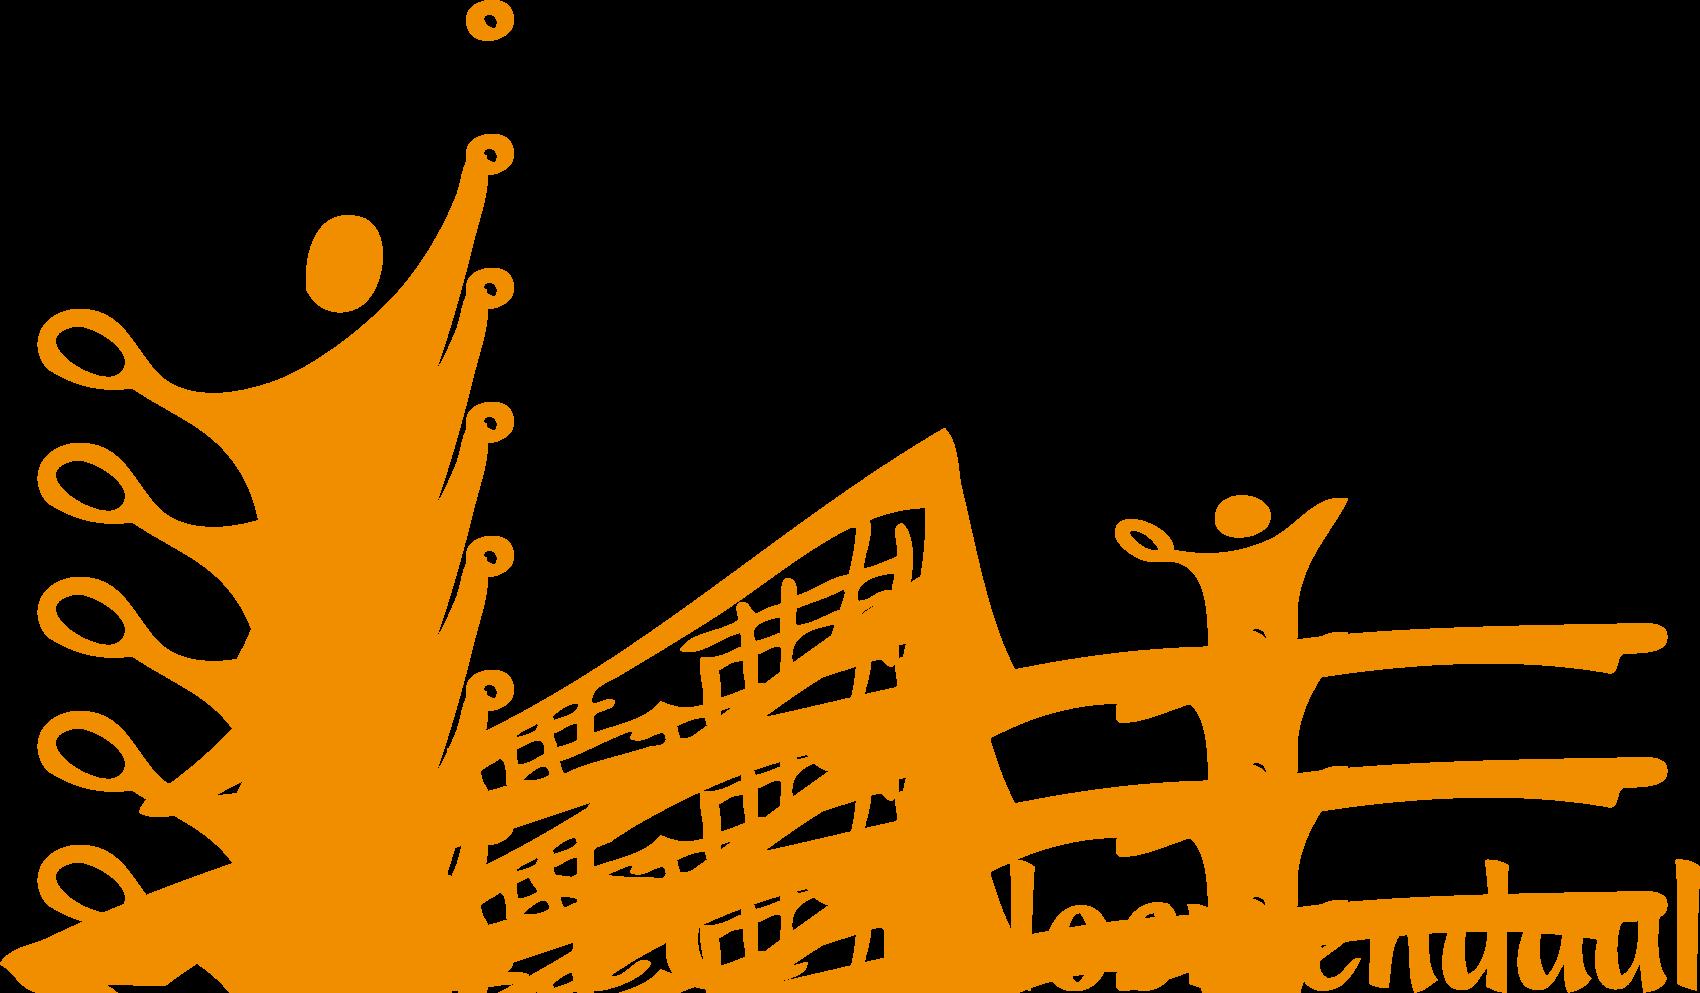 L.T.C. Bloemendaal